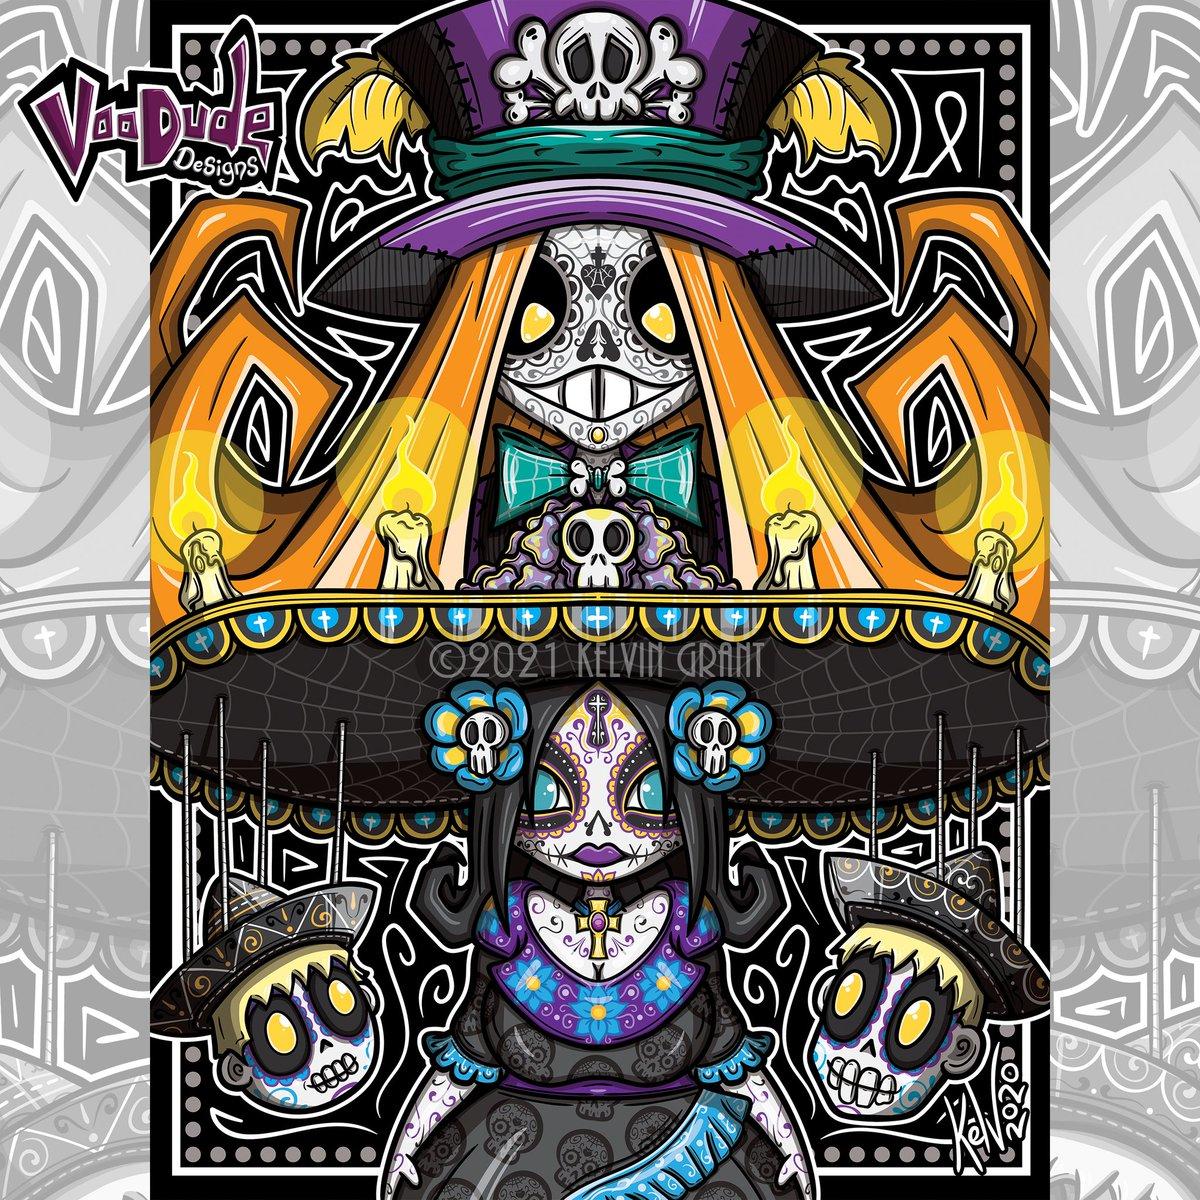 It's finally done! My family portrait for 2020 (I know it's late 🤣).   #voodudedesigns #voodoo #voodude  #dayofthedead #delosmuertos #sugarskull #diadelosmuertos #halloween #skullart #mexico #mexican #marriachi #coco #bookoflife #sugarskullmakeup #digitalartist #digitalart